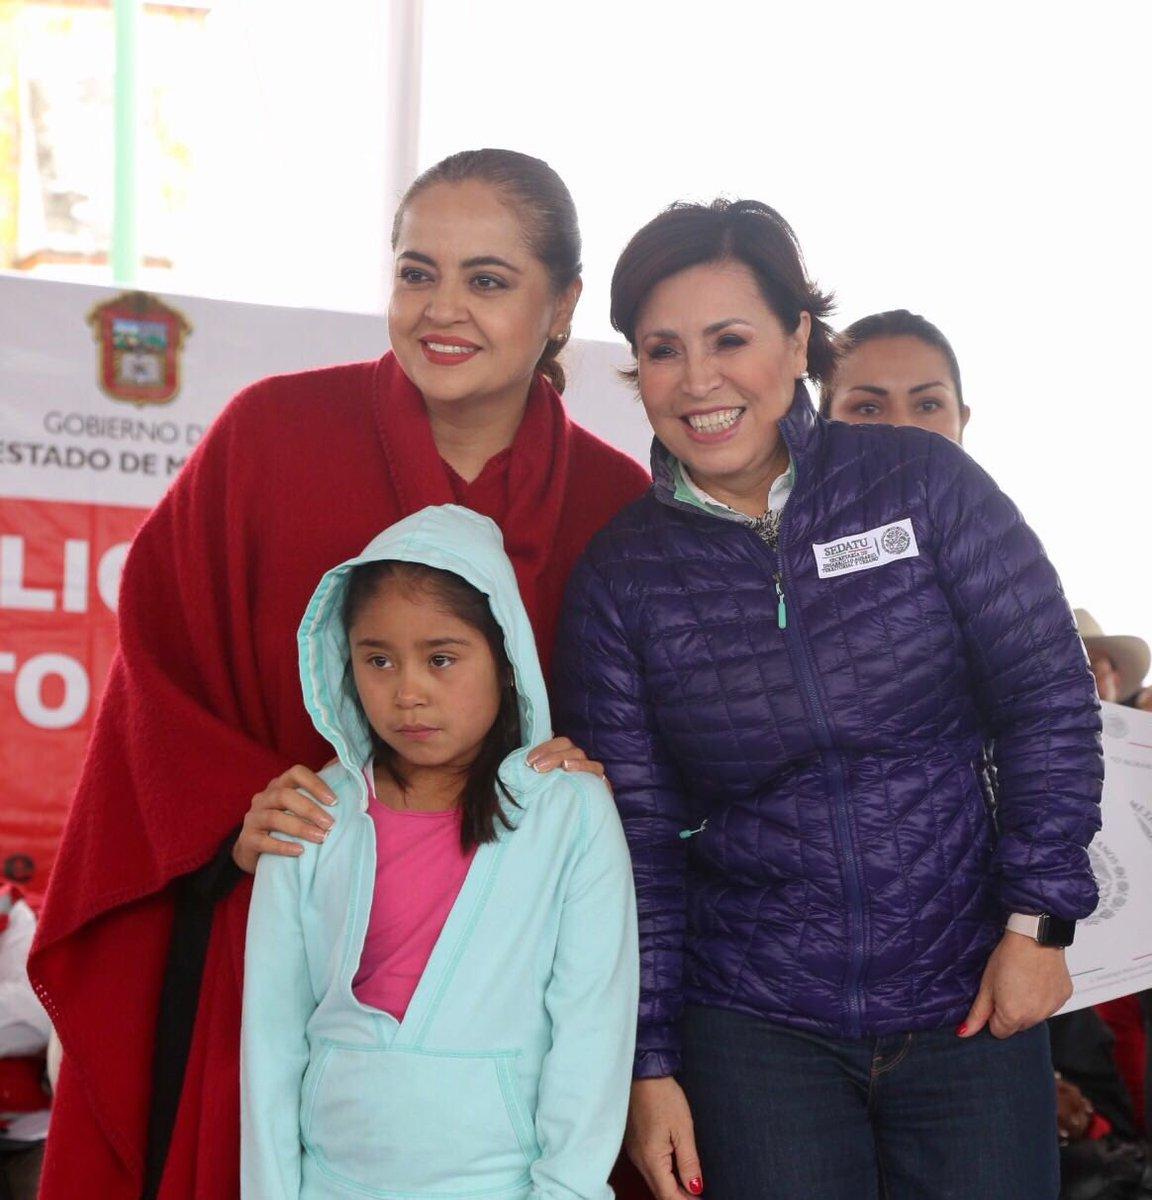 Rosario Robles: XOCHITL REYES CASTRO (@xochitlrcastro)